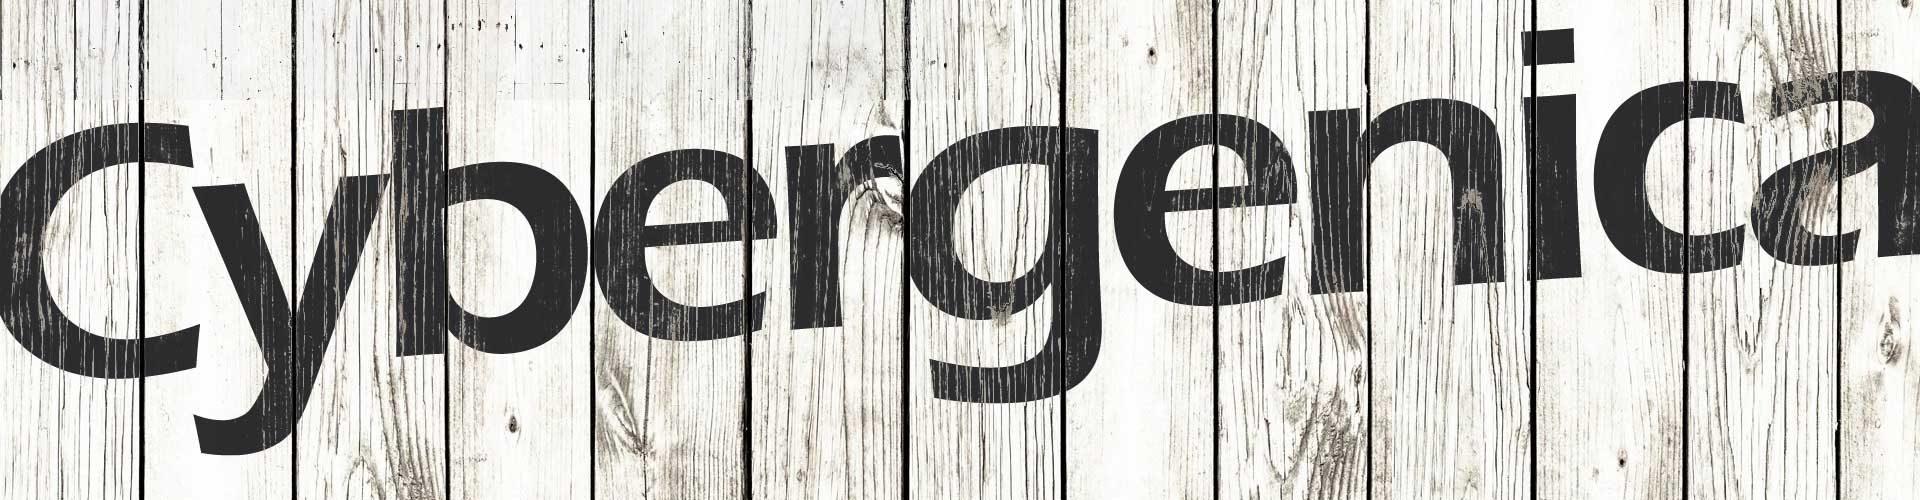 The Cybergenica Blog